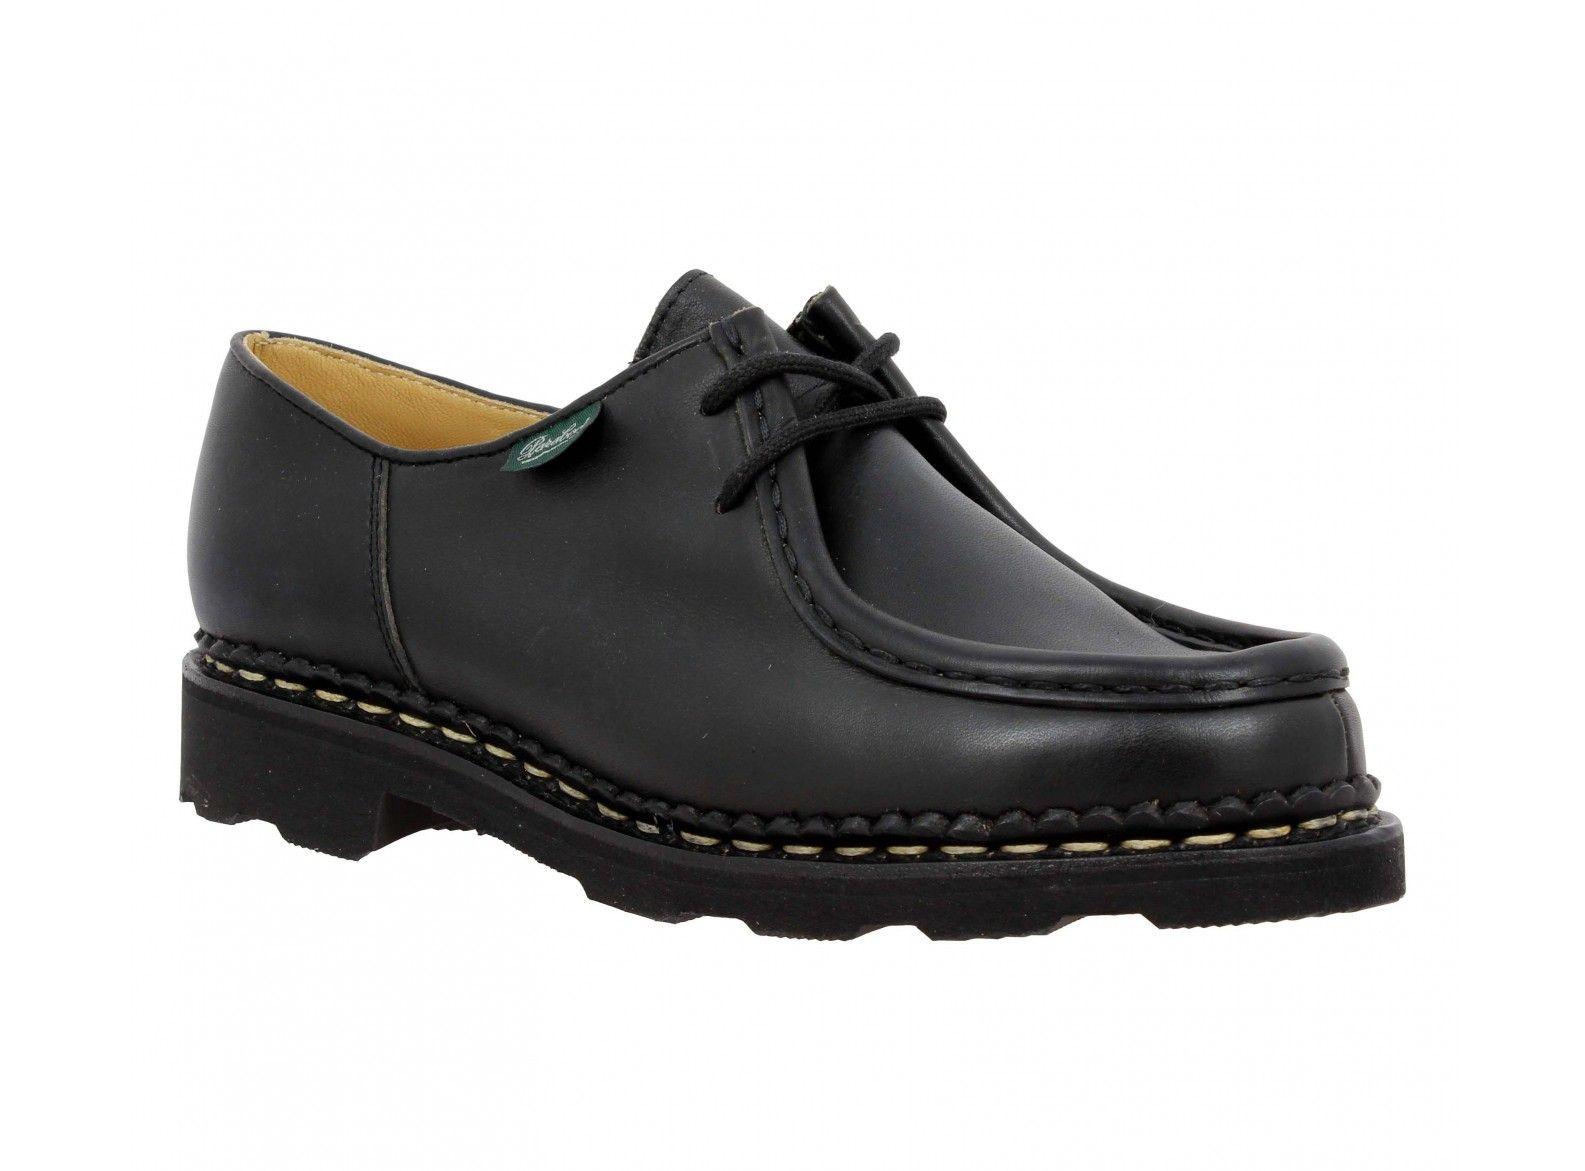 7f3b66501 PARABOOT Michael cuir Femme Noir | Ma Chaussure | Cuir femme ...